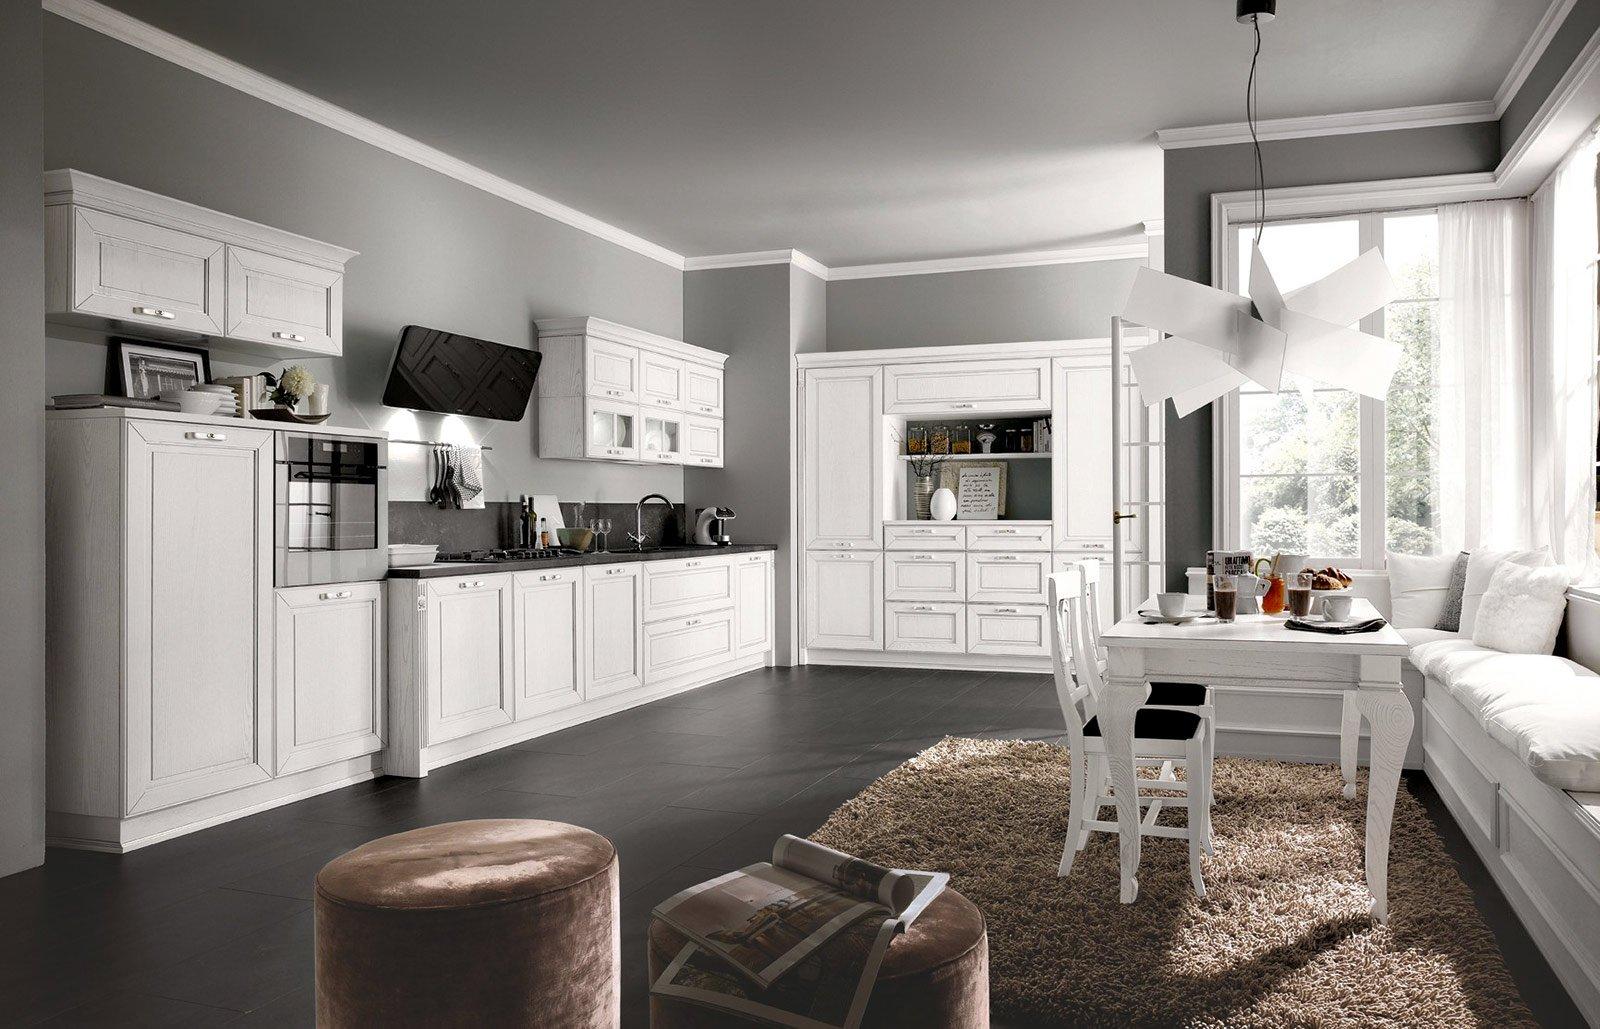 Cucina la voglio tutta bianca cose di casa for Pittura per cucina classica